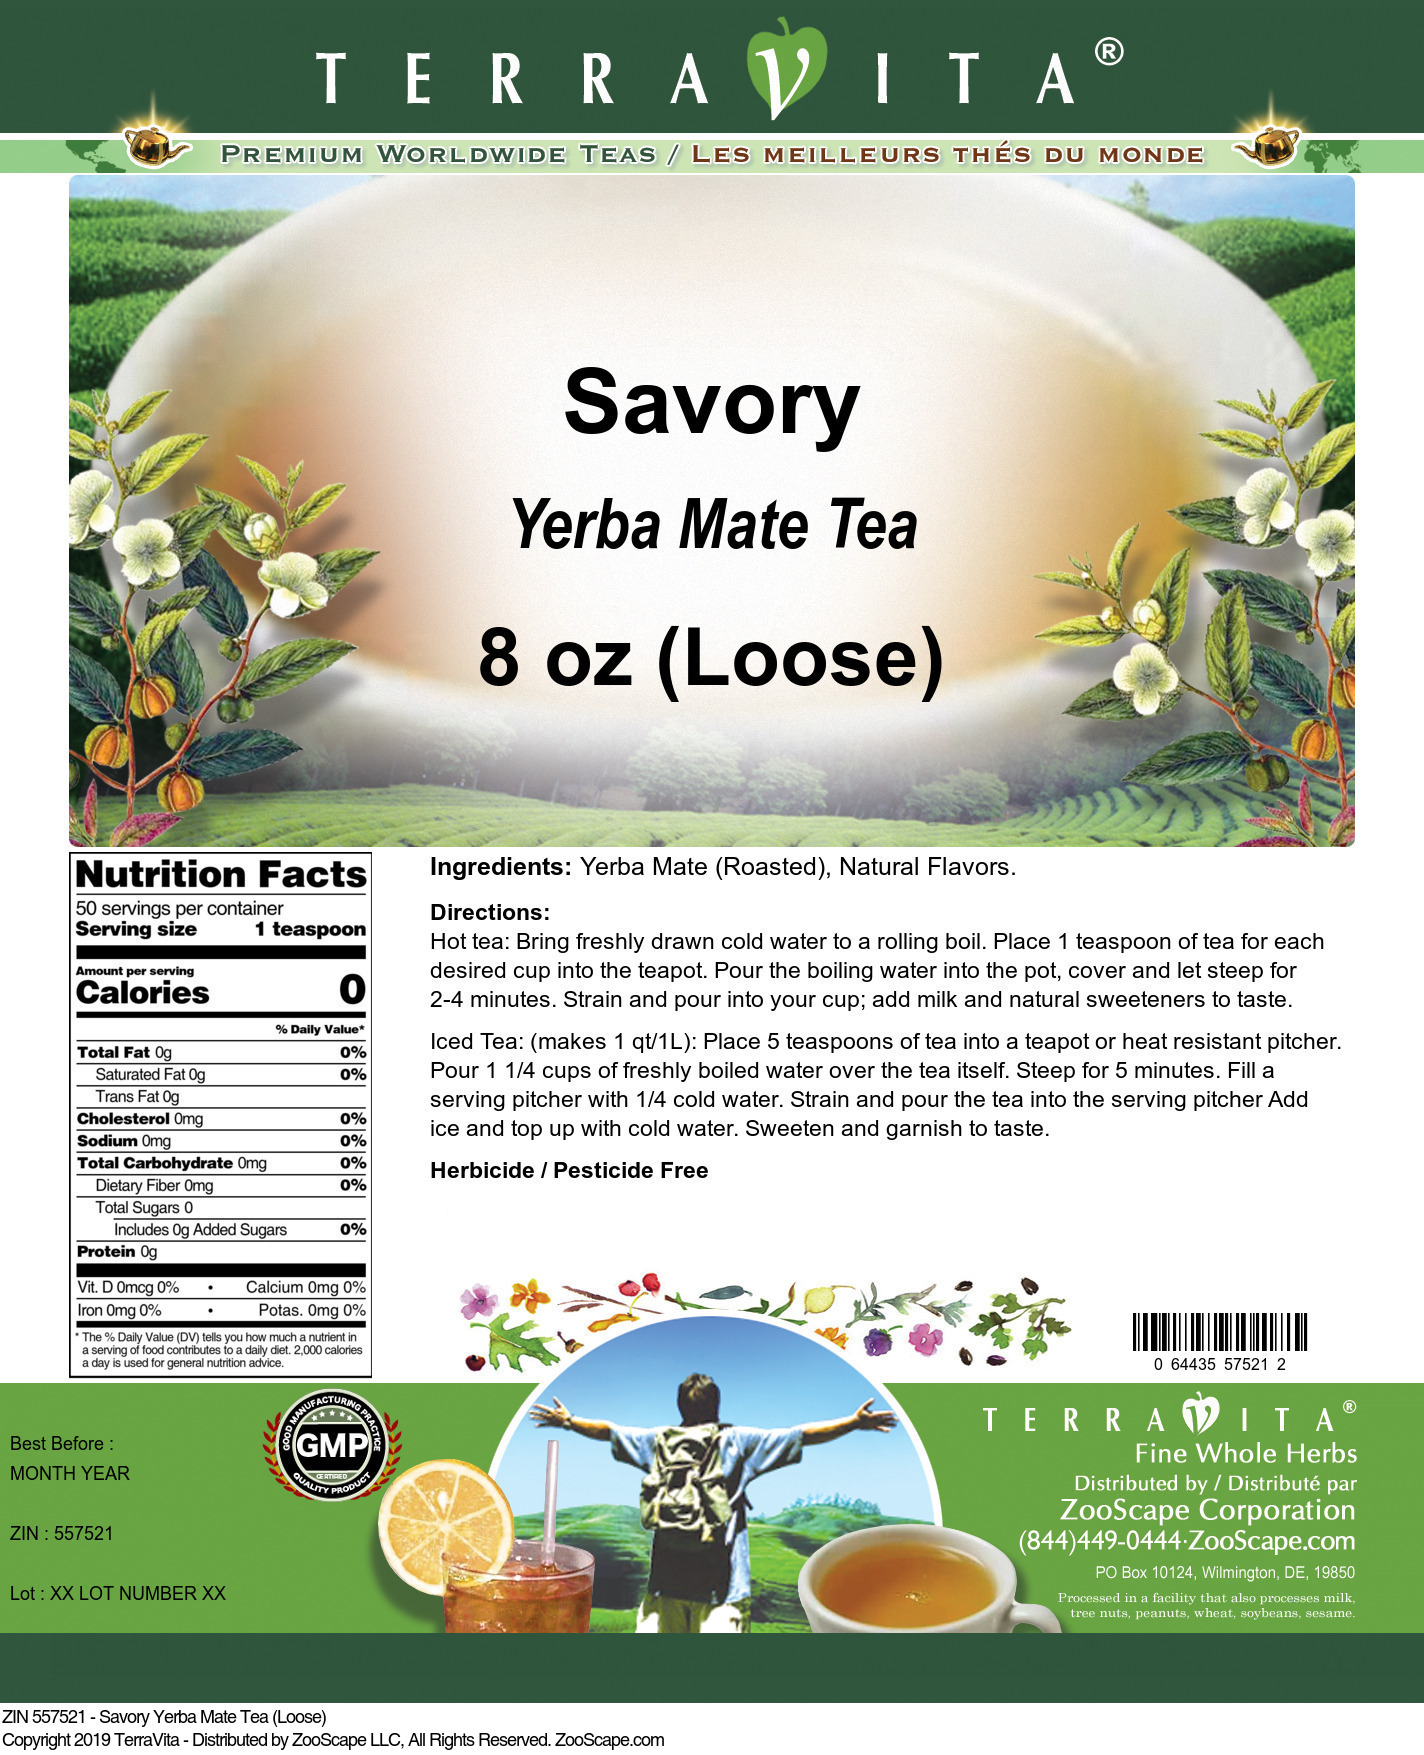 Savory Yerba Mate Tea (Loose)